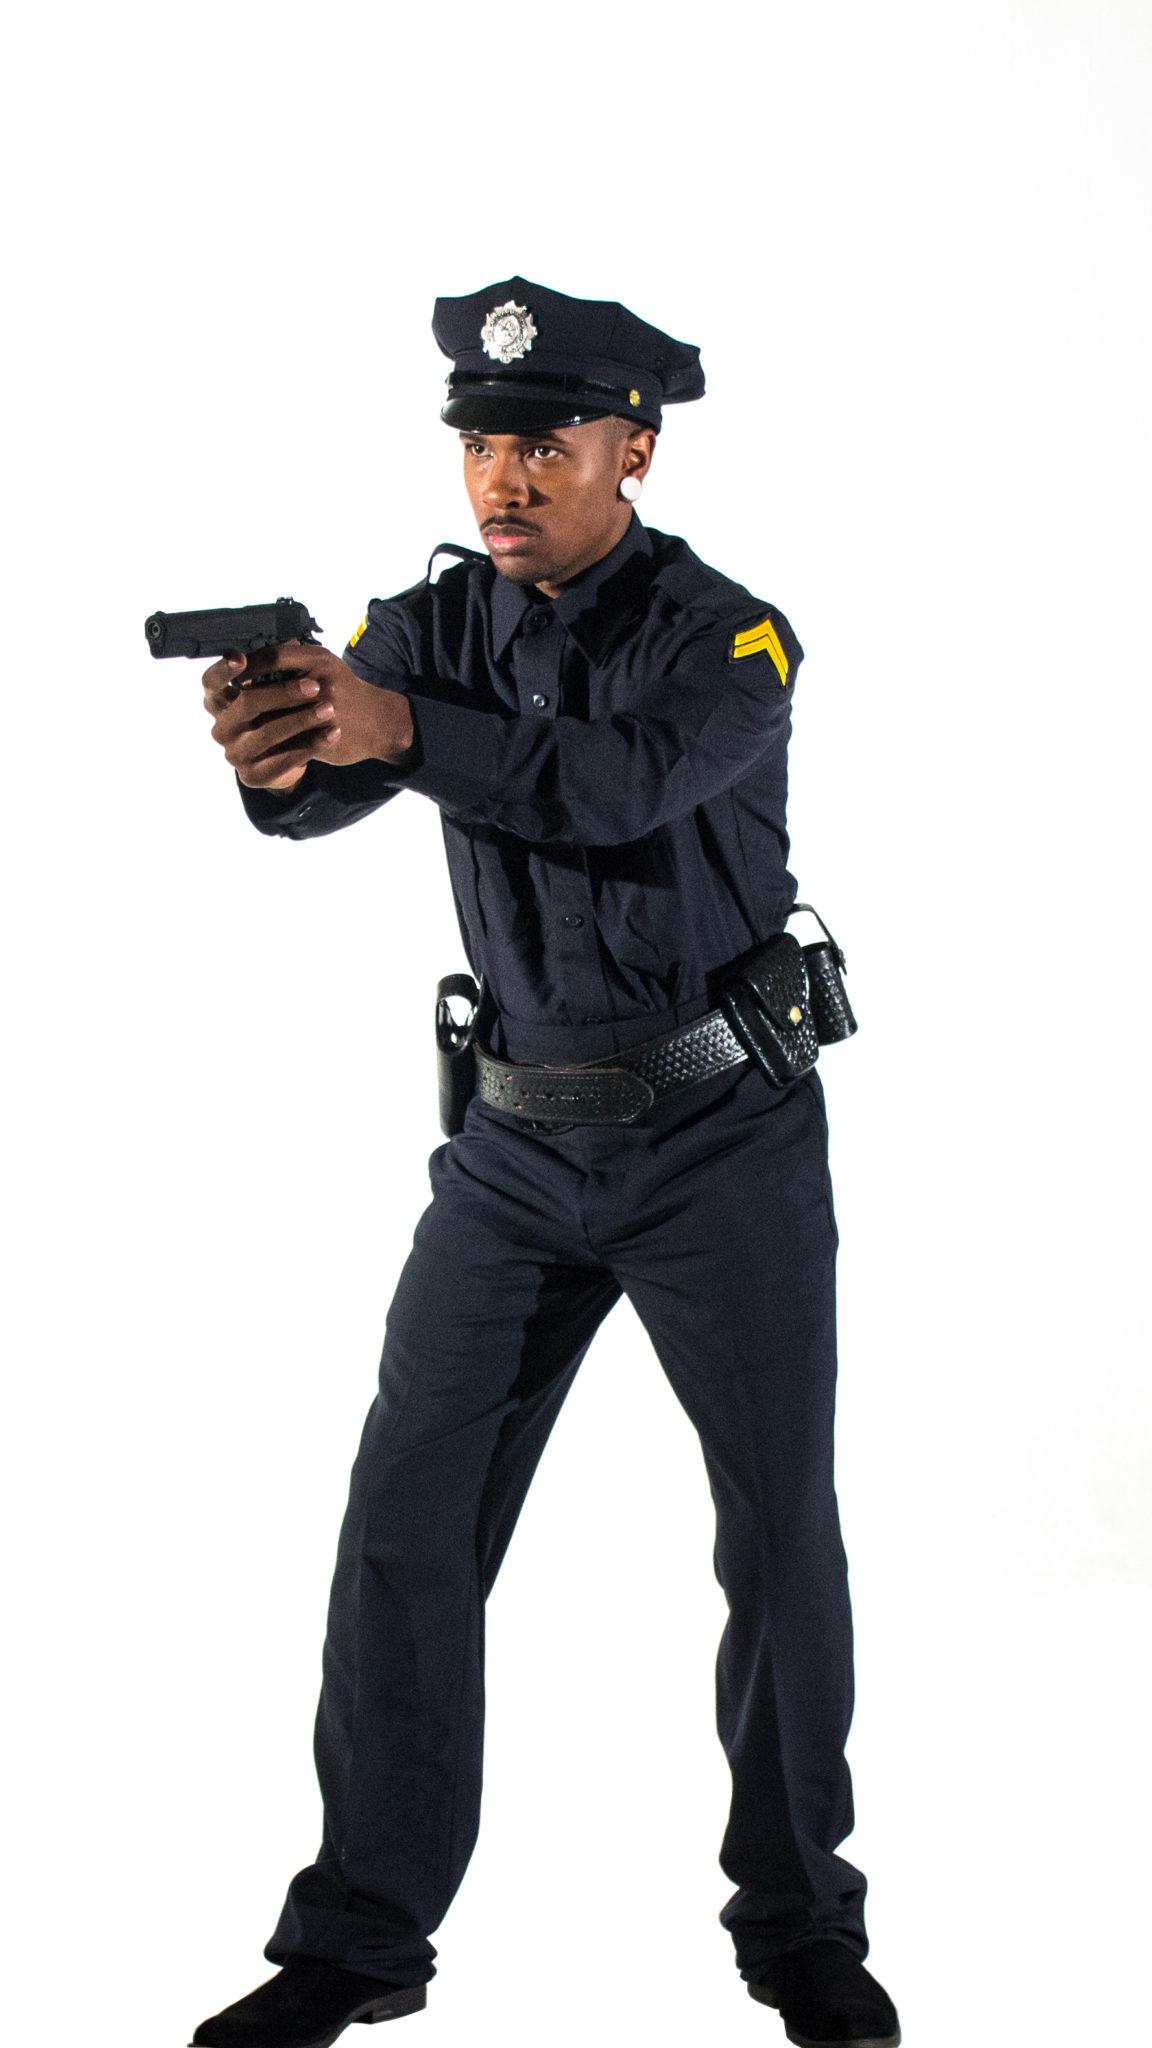 Police Uniforms For Film Budget Friendly Rentals In Los